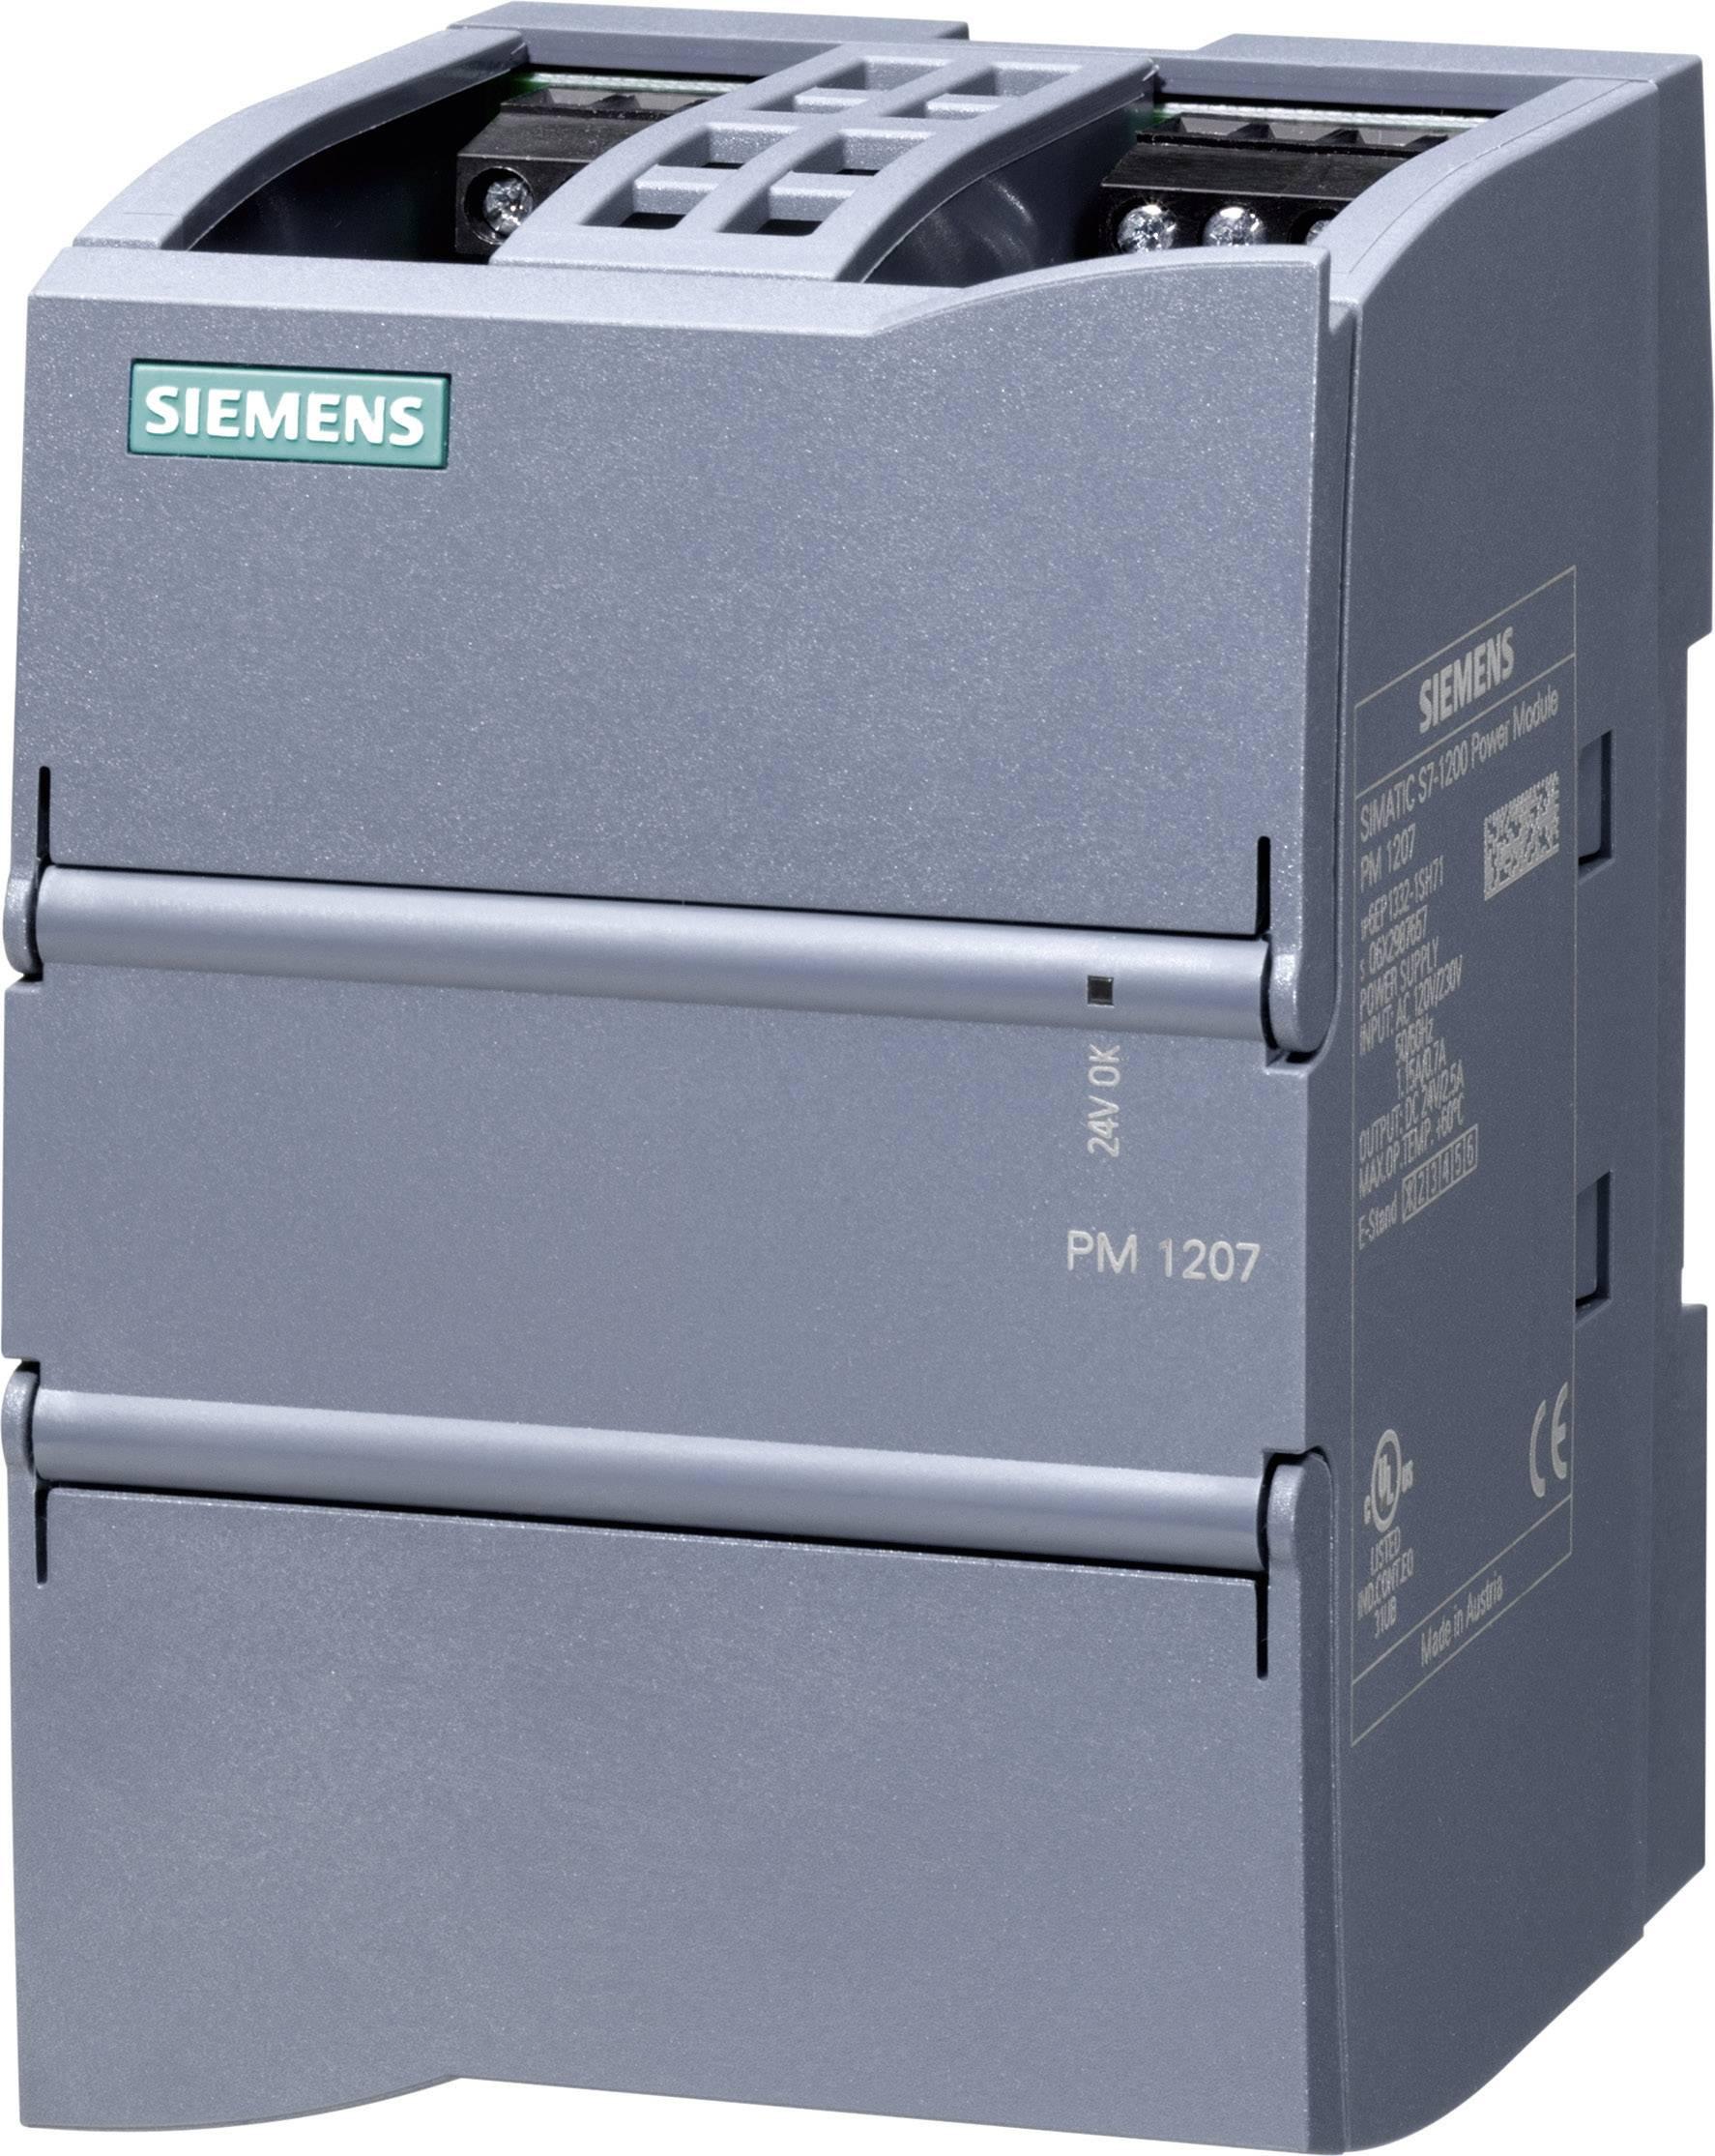 Zdroj na DIN lištu Siemens SIMATIC S7-1200 PM1207, 24 V/DC, 2,5 A